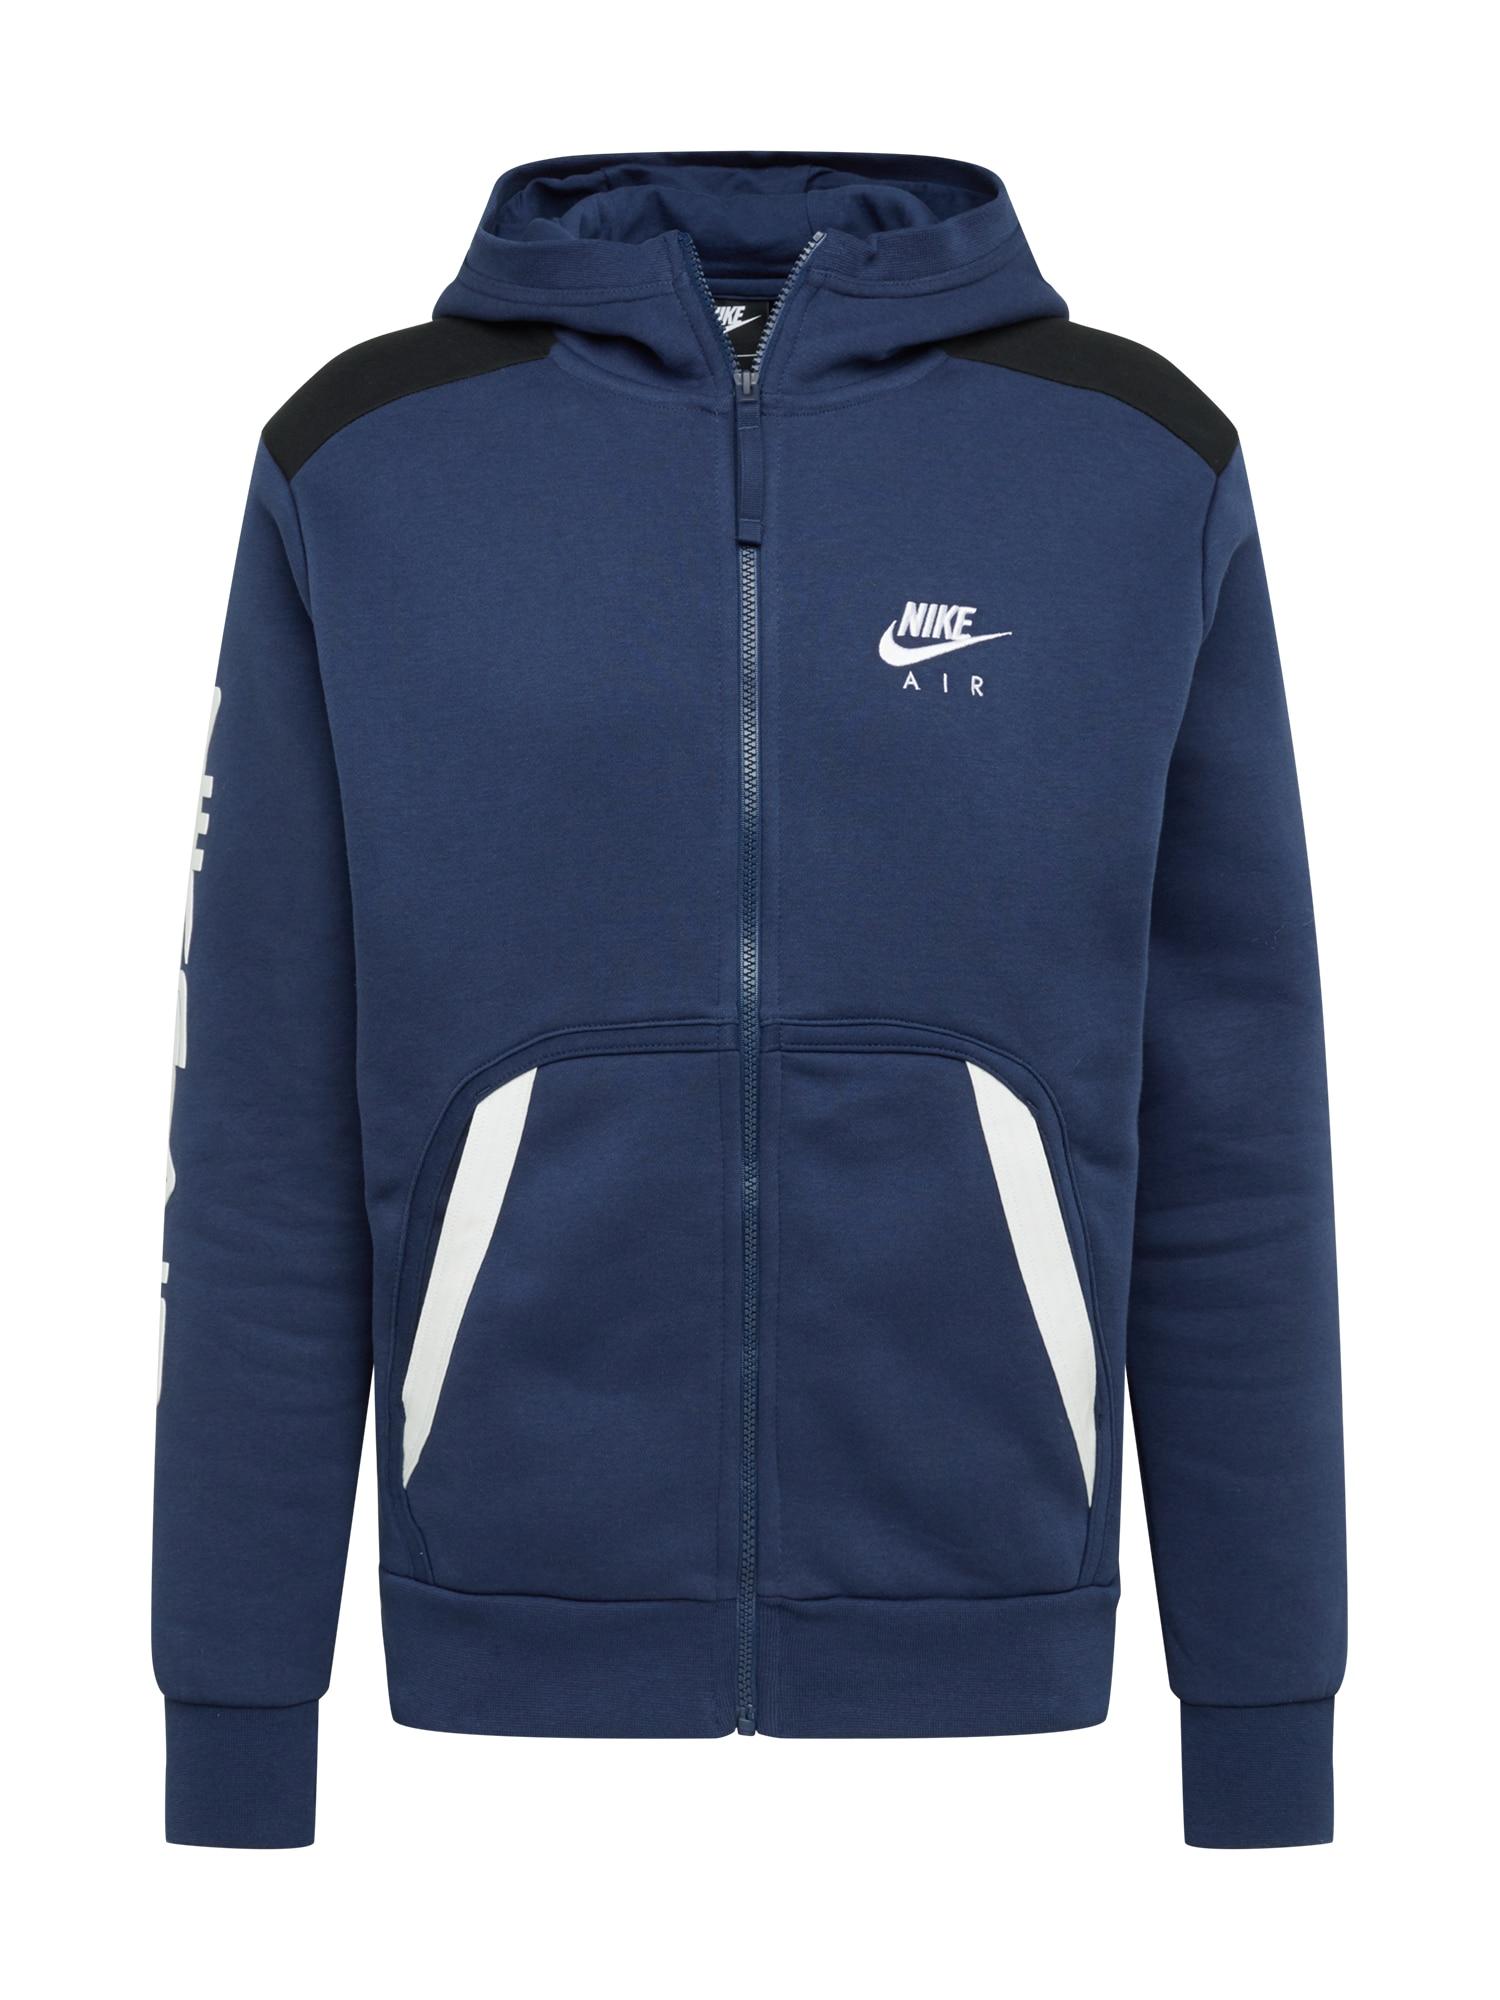 Nike Sportswear Džemperis balta / tamsiai mėlyna / juoda